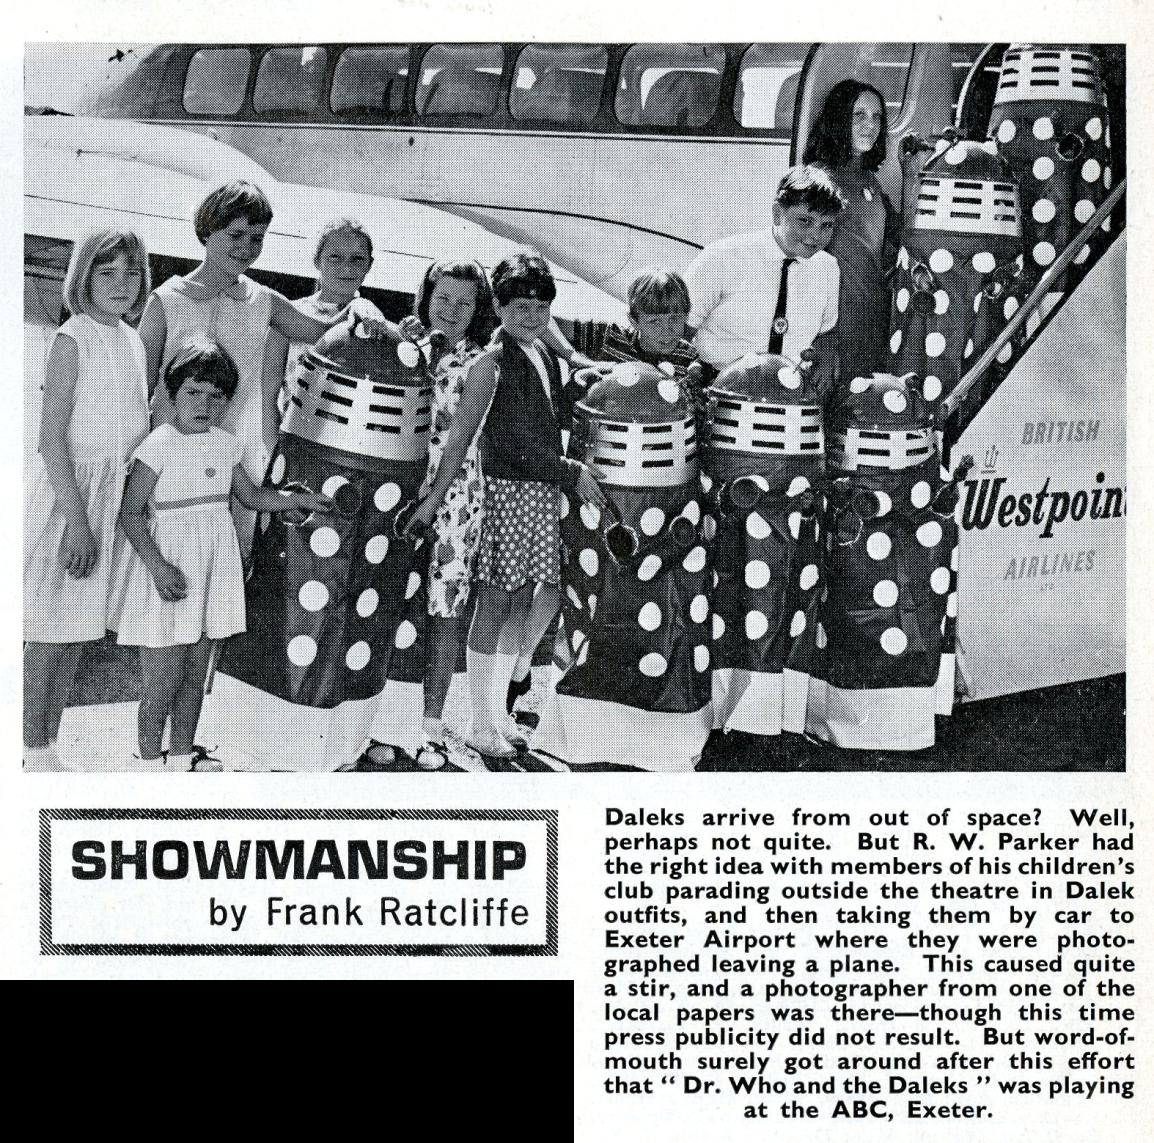 Kine Weekly, 14 October 1965